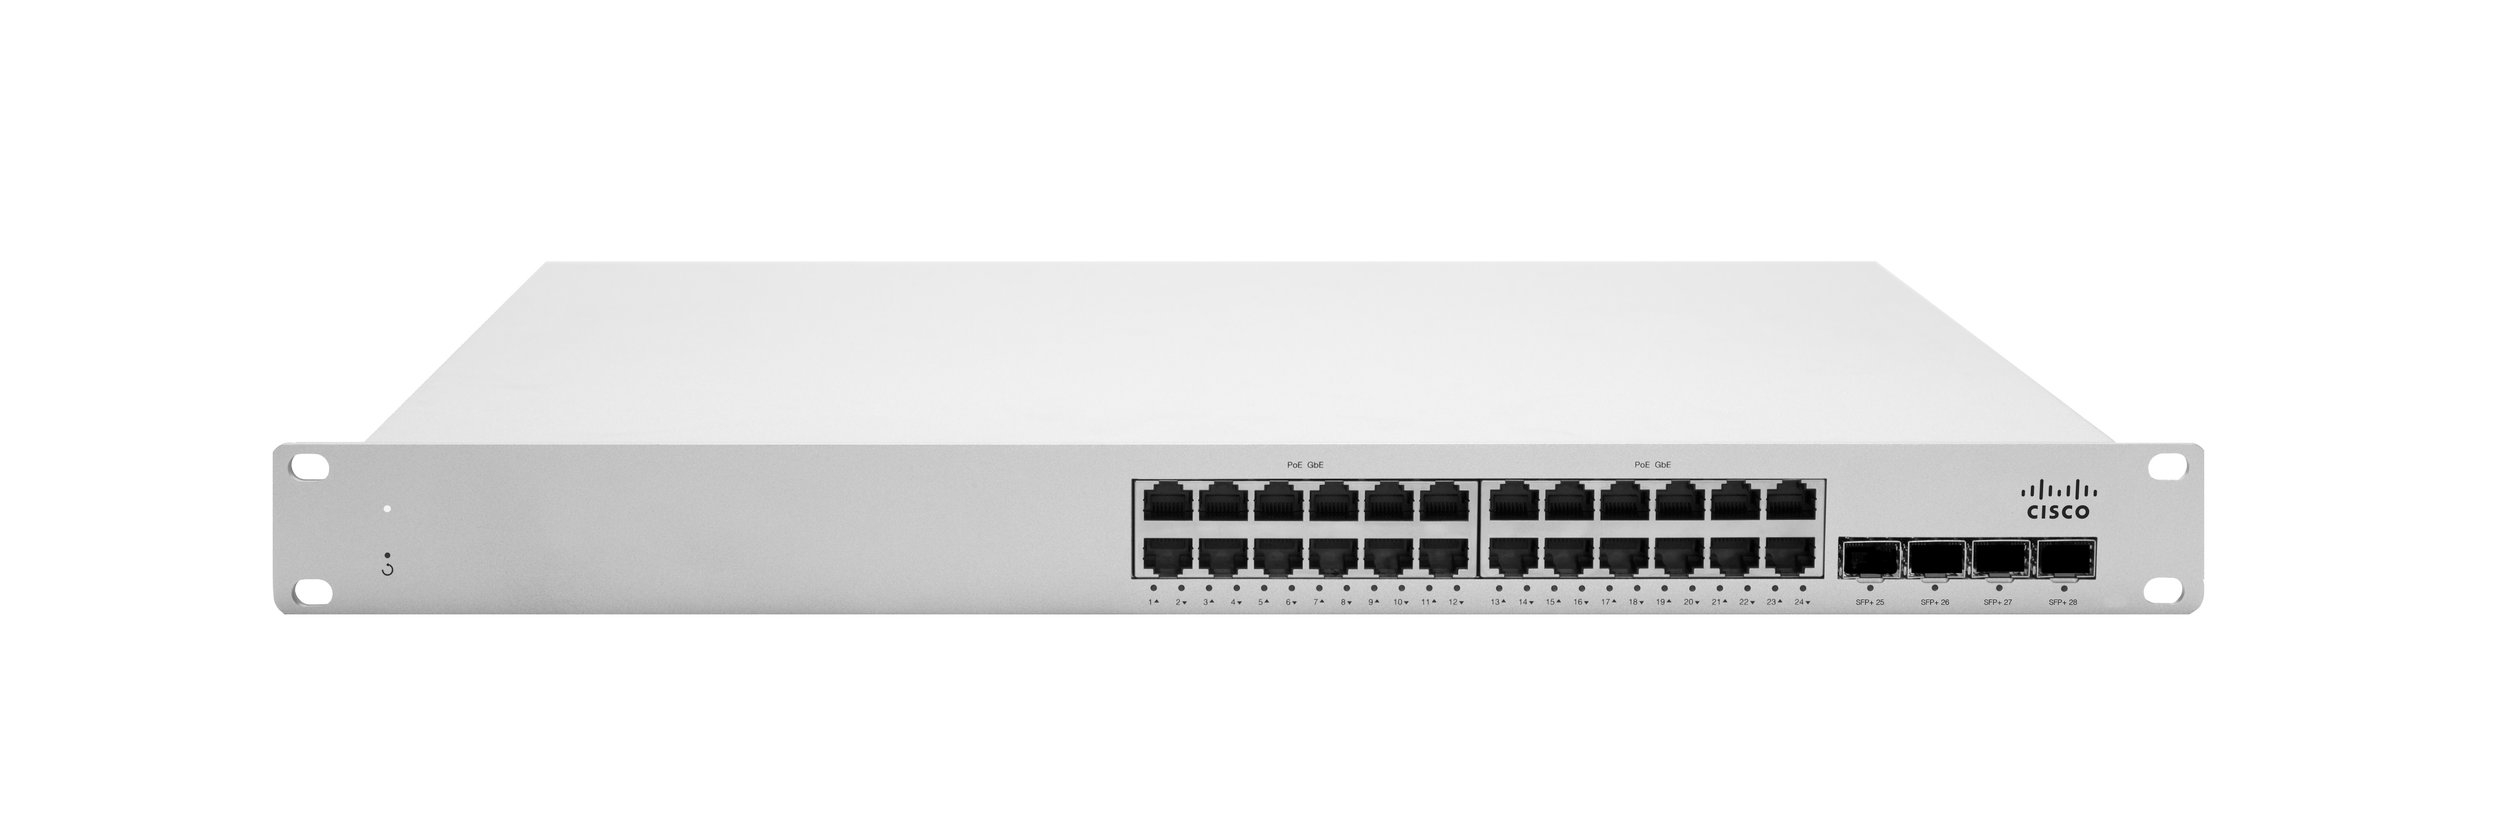 Cisco Meraki Stackable Access Switch MS250-24